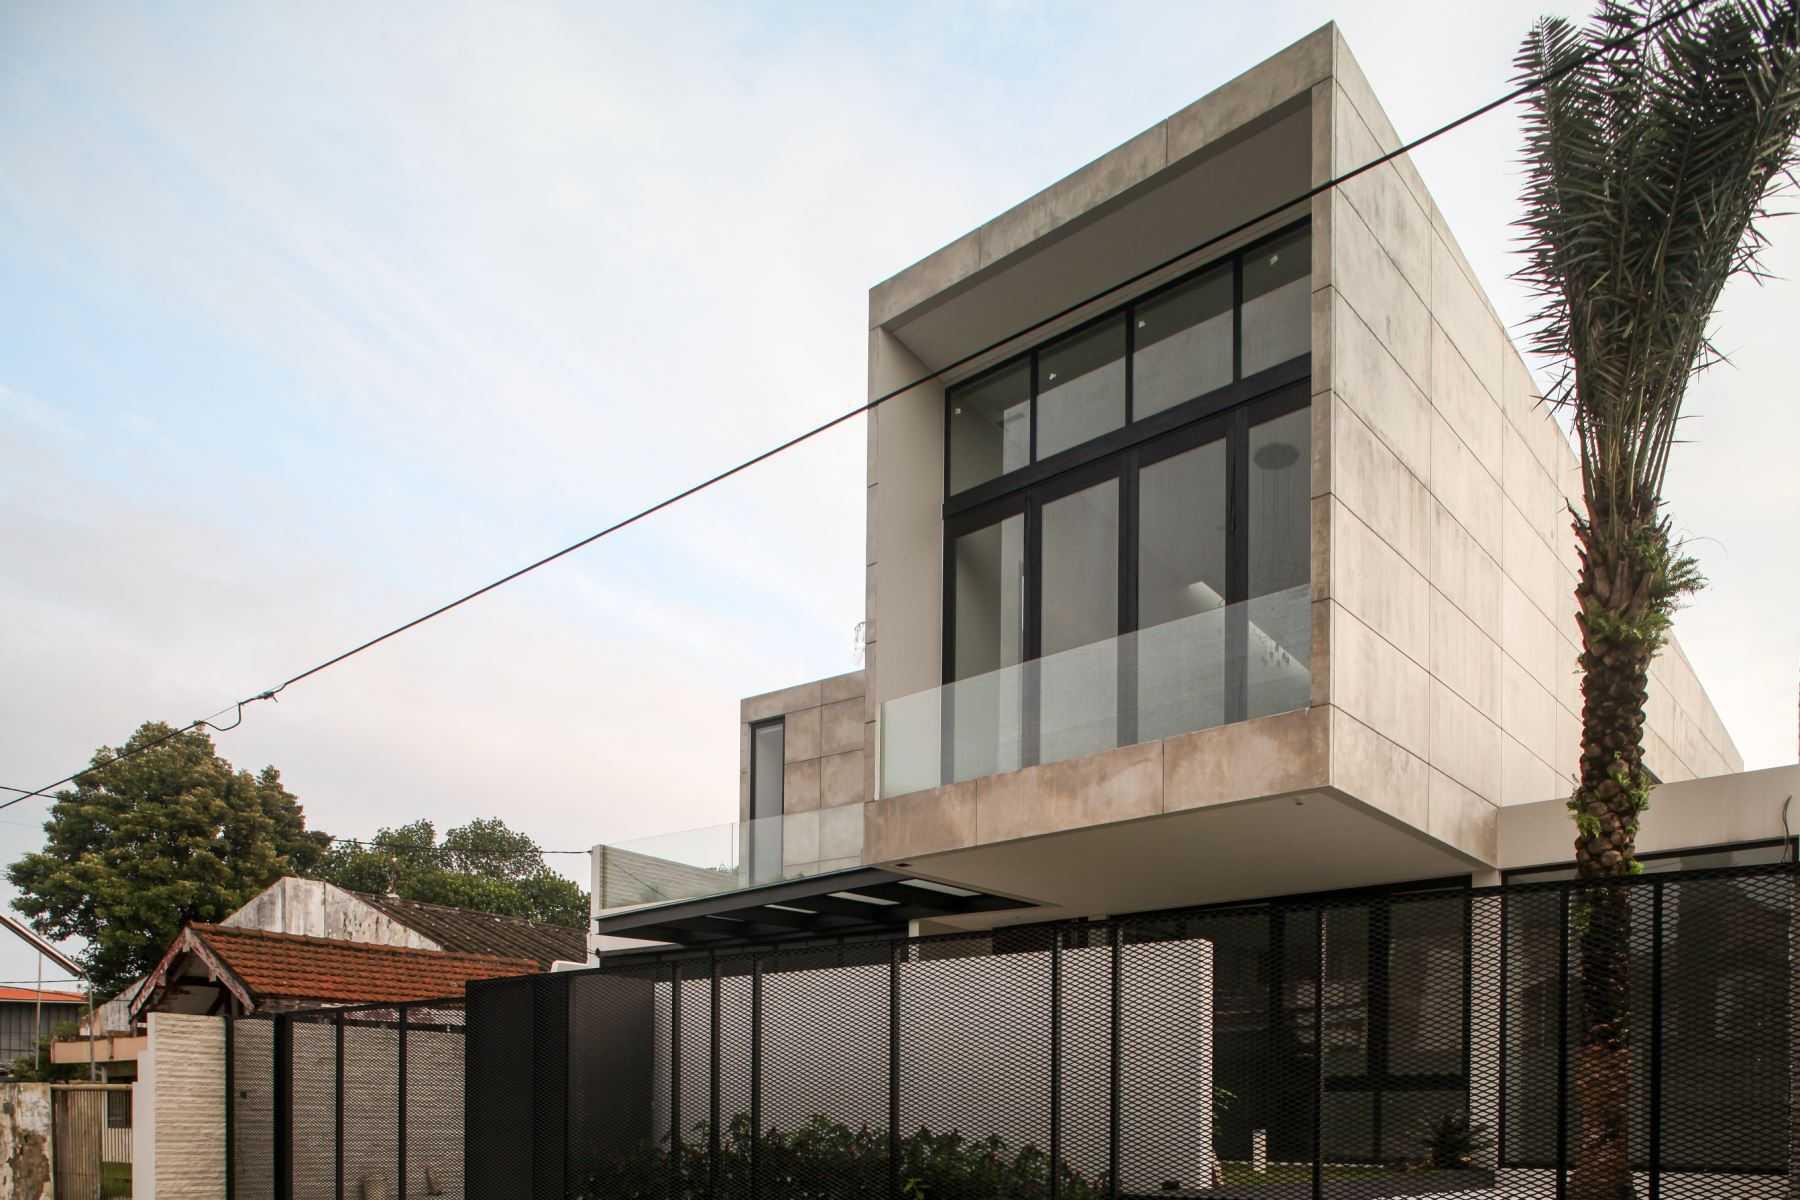 Ivan Priatman Architecture Rl House Surabaya, Kota Sby, Jawa Timur, Indonesia Surabaya, Kota Sby, Jawa Timur, Indonesia Ivan-Priatman-Architecture-Rl-House   59089